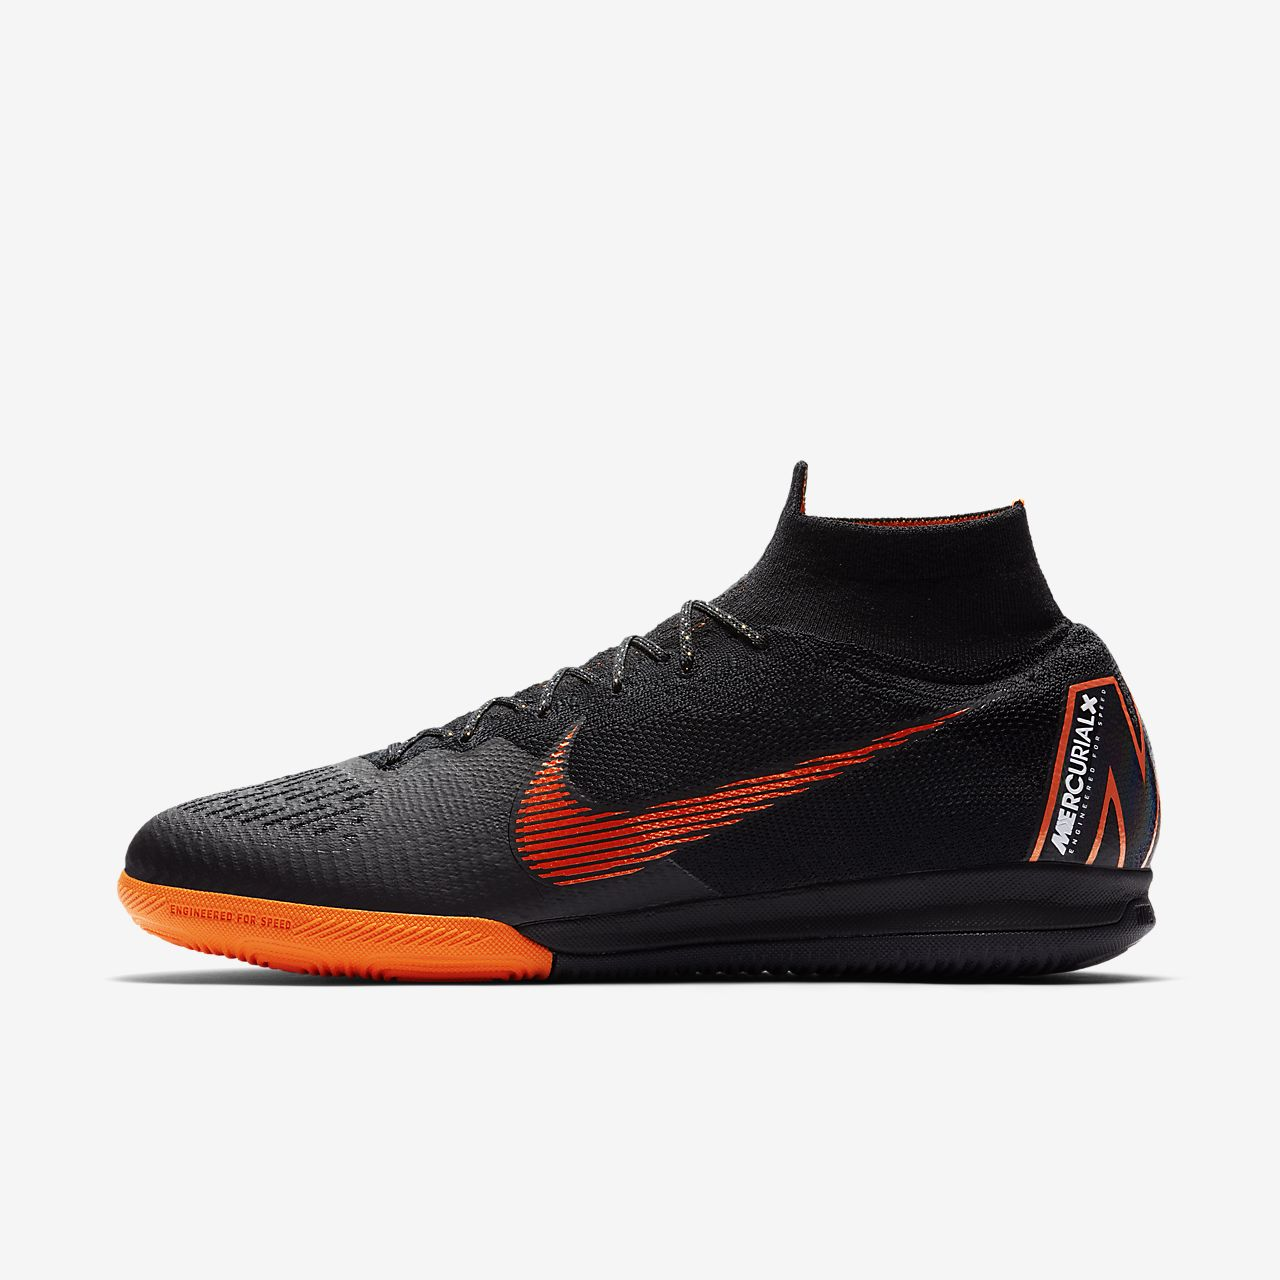 b8a9dc0b52 Chaussures de foot nike Mercurial Victory IV TF Noir Blanc Mercurial Futsal  nike superfly futsal